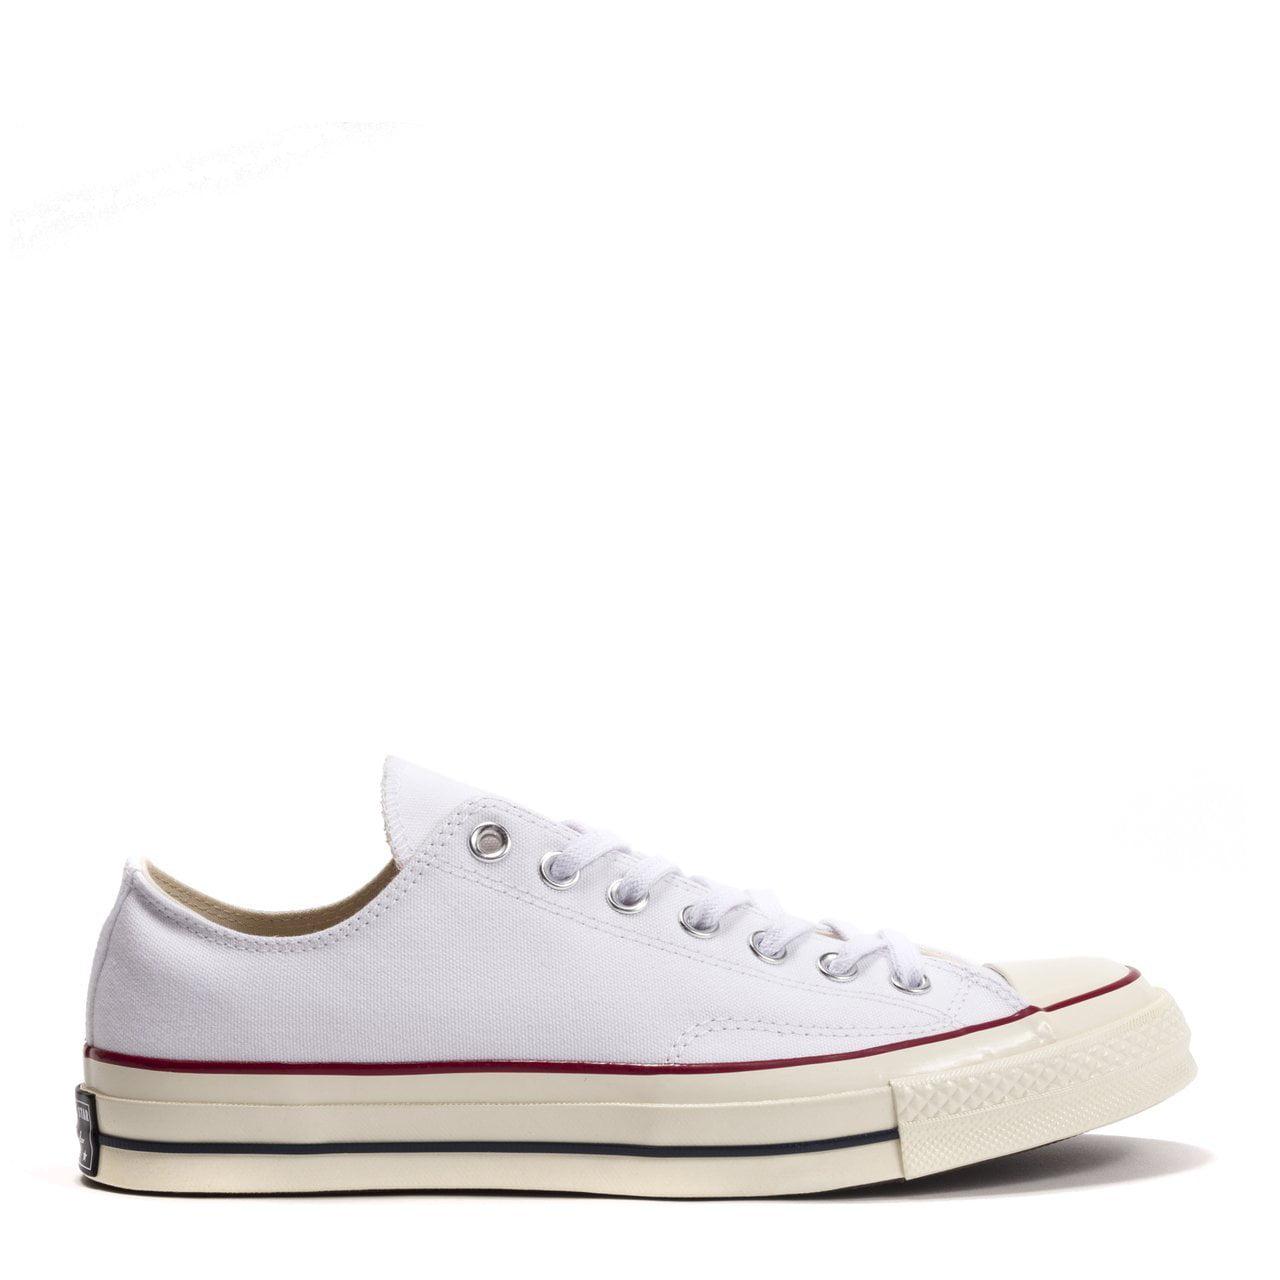 Converse Mens Converse Chuck Taylor All Star 70 Low Top White Garnet Egret 1620